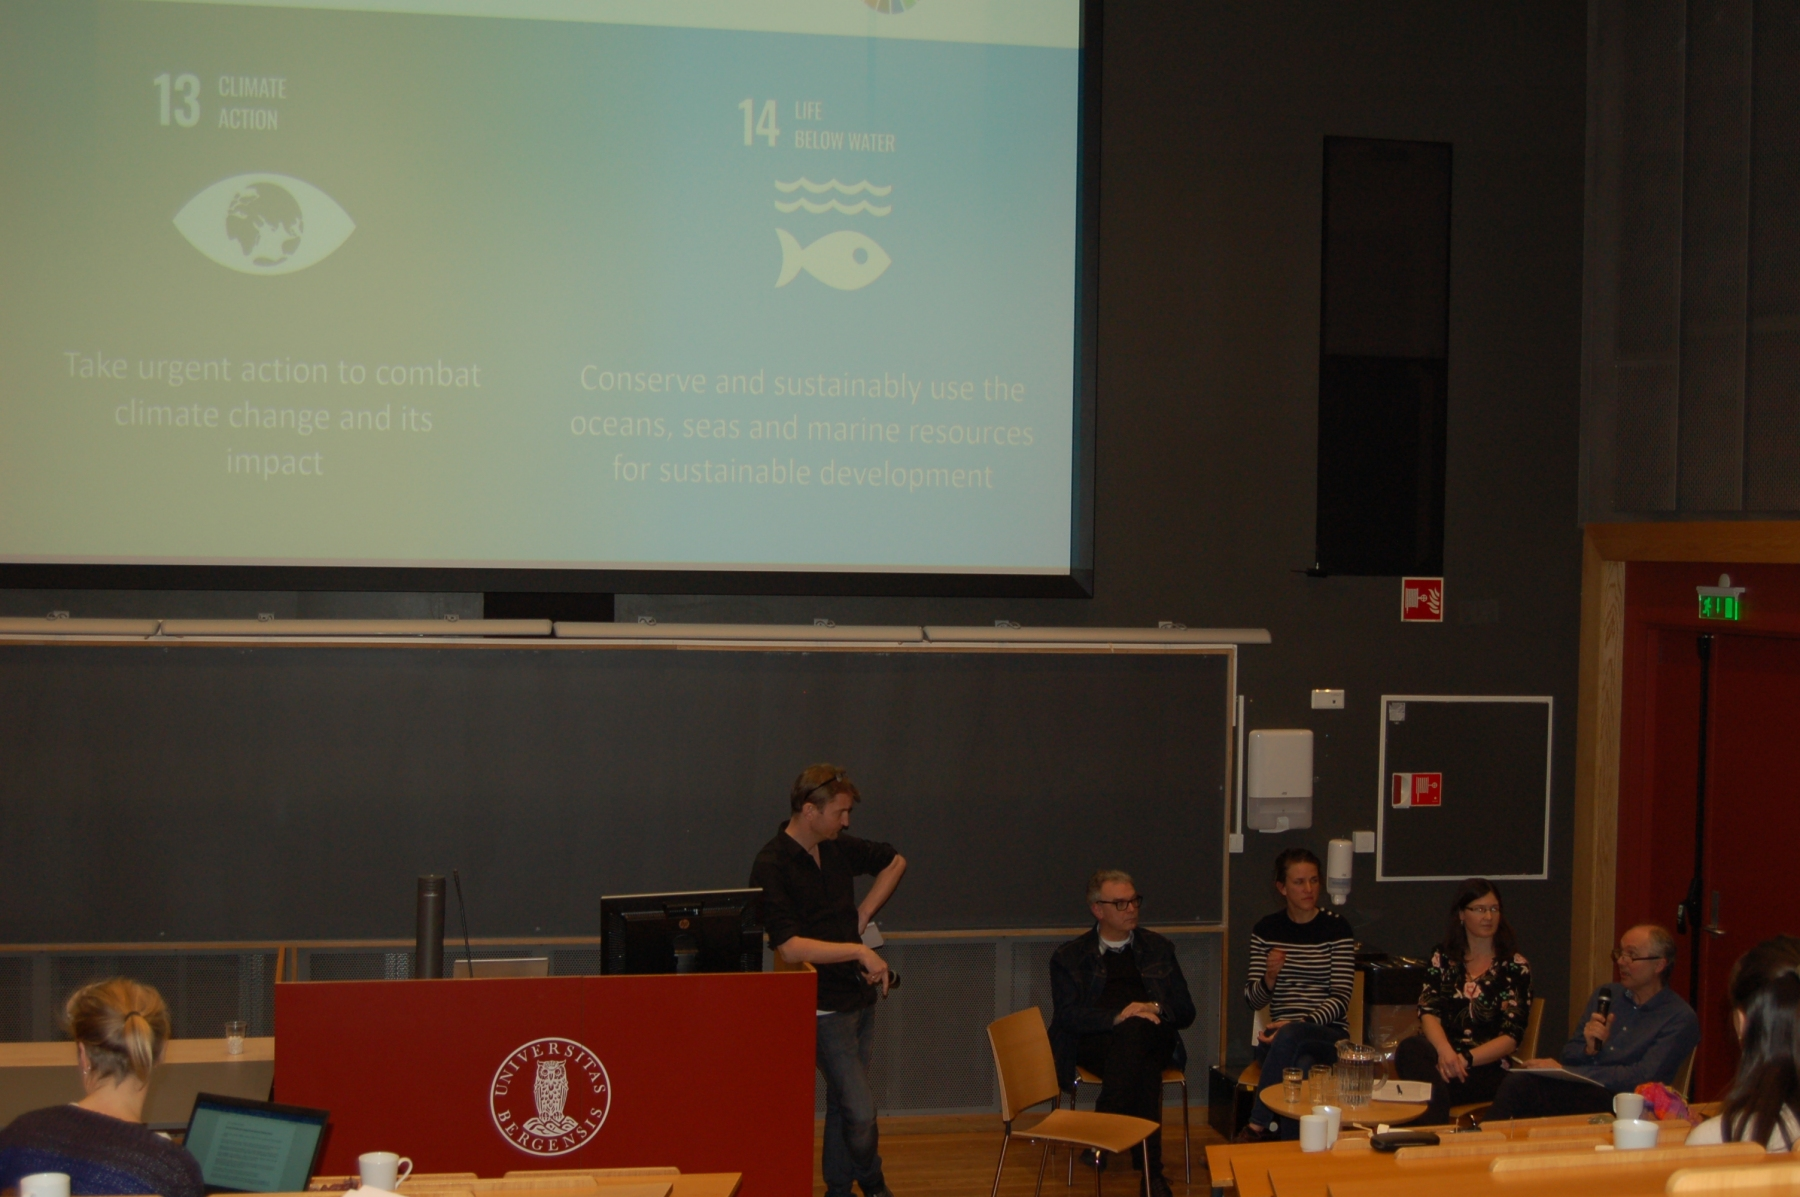 Audience engaging expert panel discussion, from left: Are Olsen (moderator, UiB), Christoph Heinze (UiB), Filippa Franser (UiB), Helene Langehaug (NERSC), Morten Skogen (IMR)